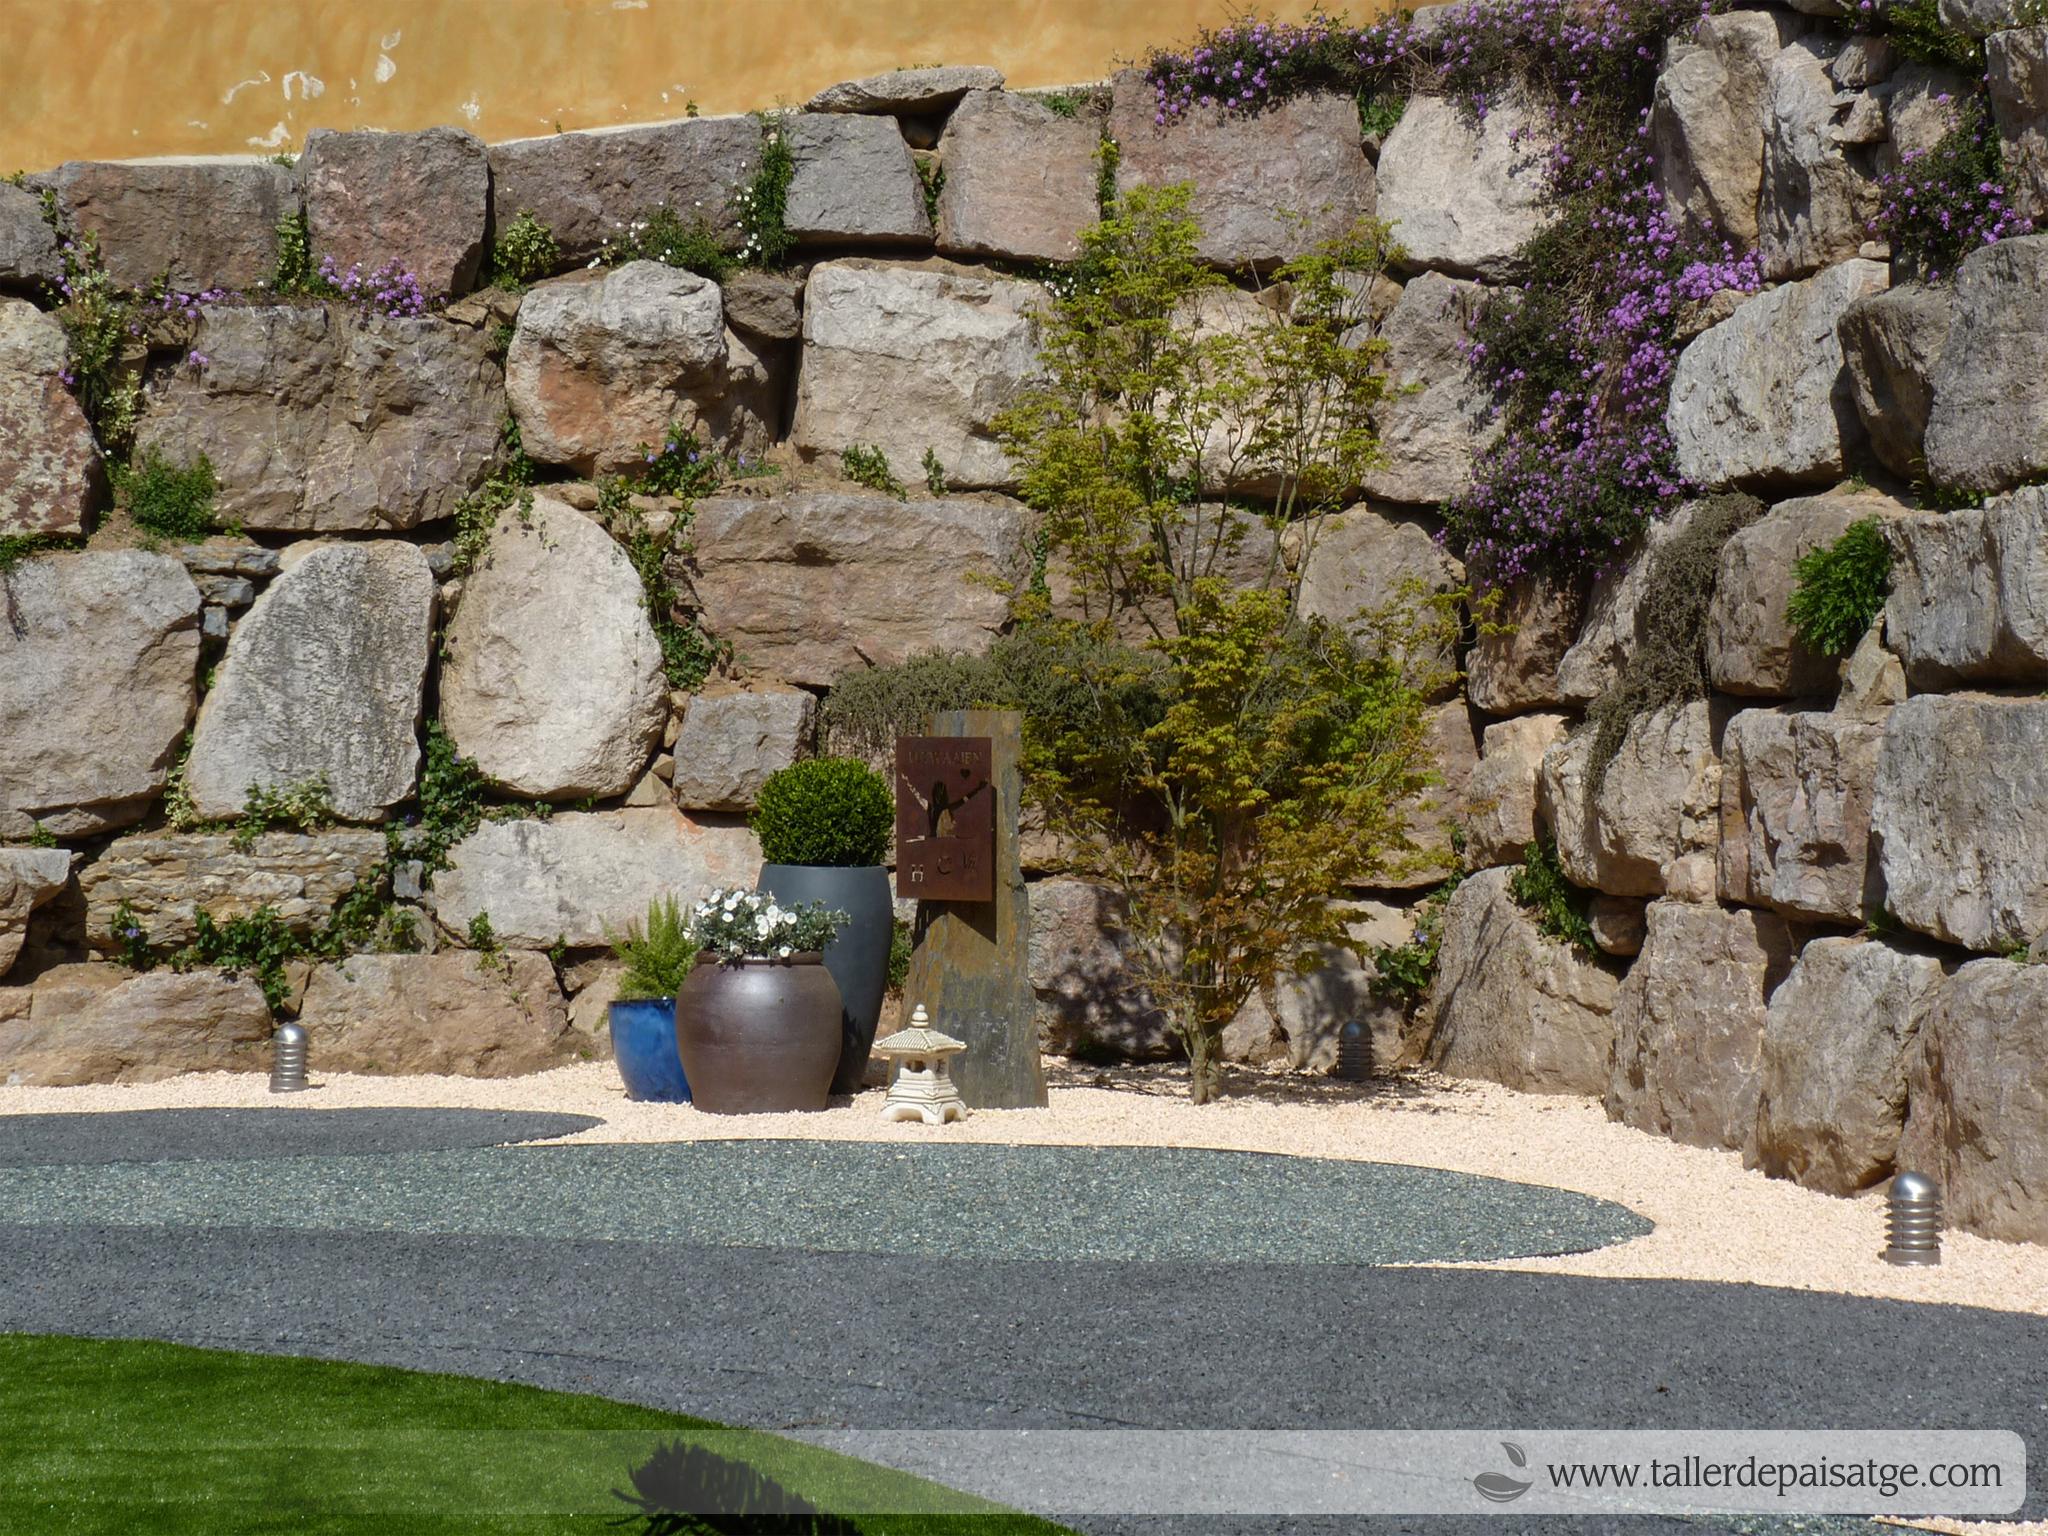 www.tallerdepaisatge.com